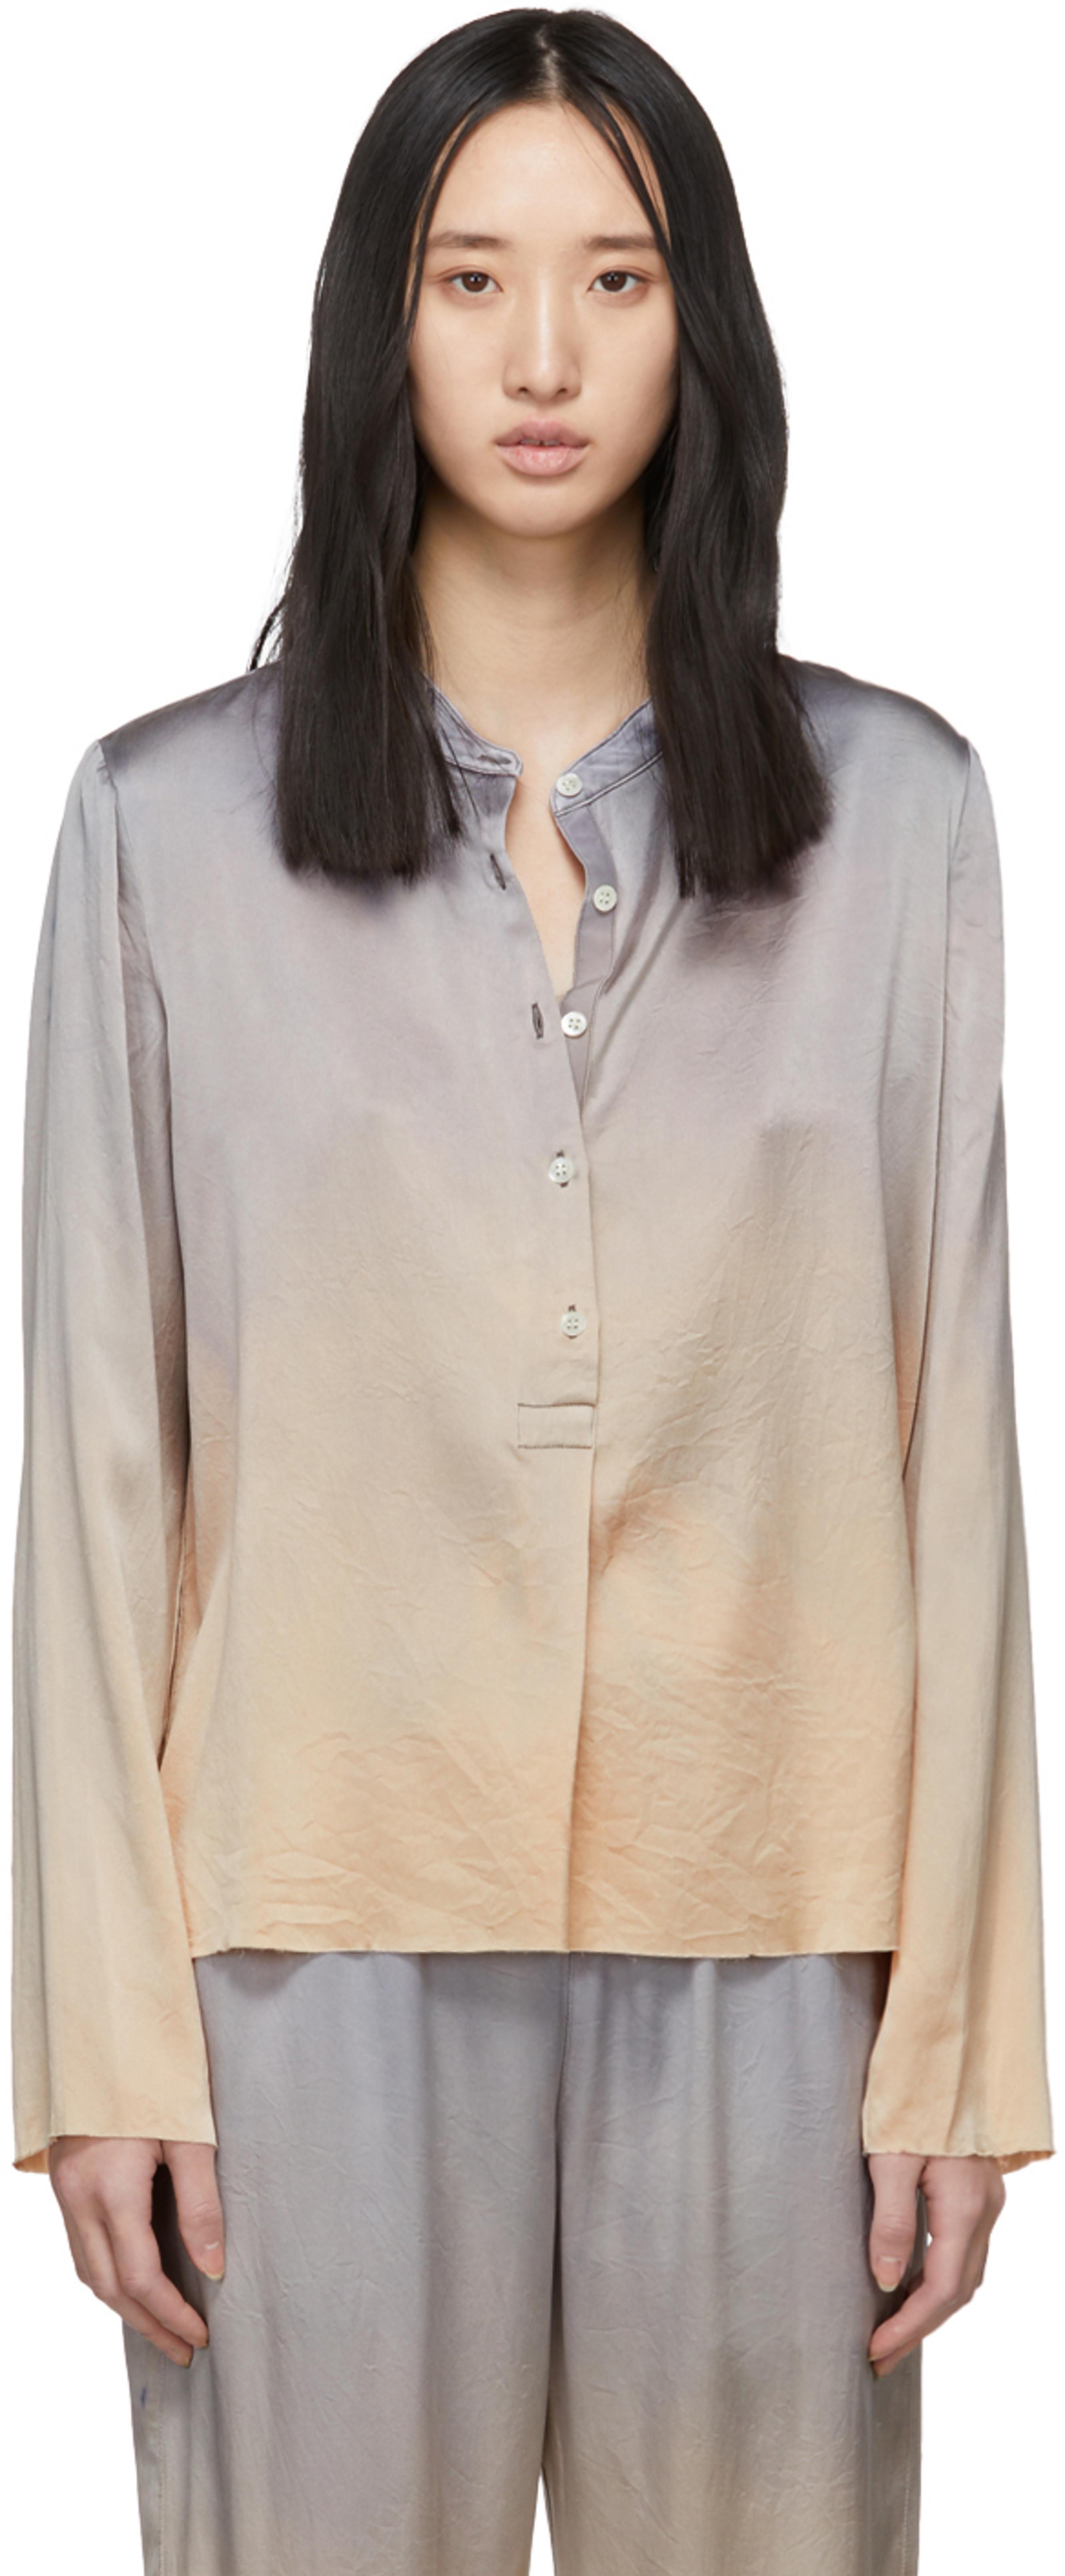 0dba279c3282ca Raquel Allegra clothing for Women